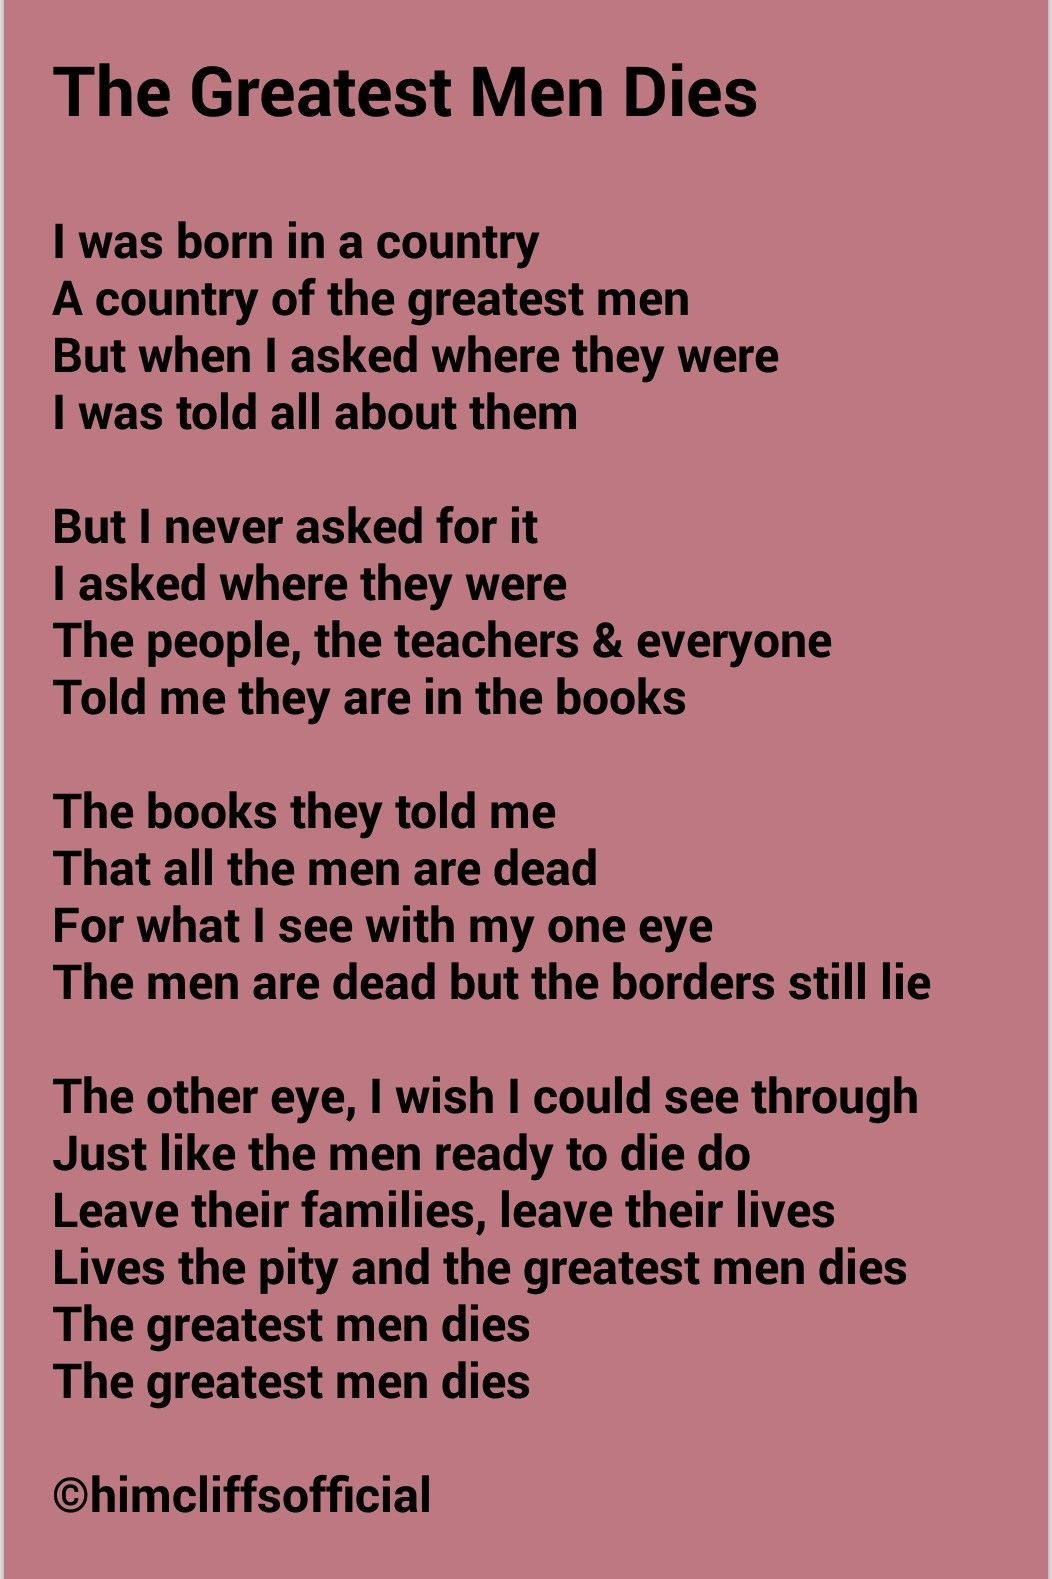 #poem #poetry #art #cool #idc #philosophy #love #Patriots #country #patriotic #flag #soilder #army #tttpublishing #ttt #poemes   #writersofttt #tttpublishing #tttprompt #pancakes #poem #poetry #everything #art #artistsoninstagram #artist #poemsofinstagram #poemsporn #poetsofig #writersofinstagram #writerscommunity #poetrylovers #poetryisart #poetsofinsta #poetess #poemes #poetsandwriters #poemsoftheday #poetsociety #poetsociety #poetryporn #poemsaboutlove #poemz